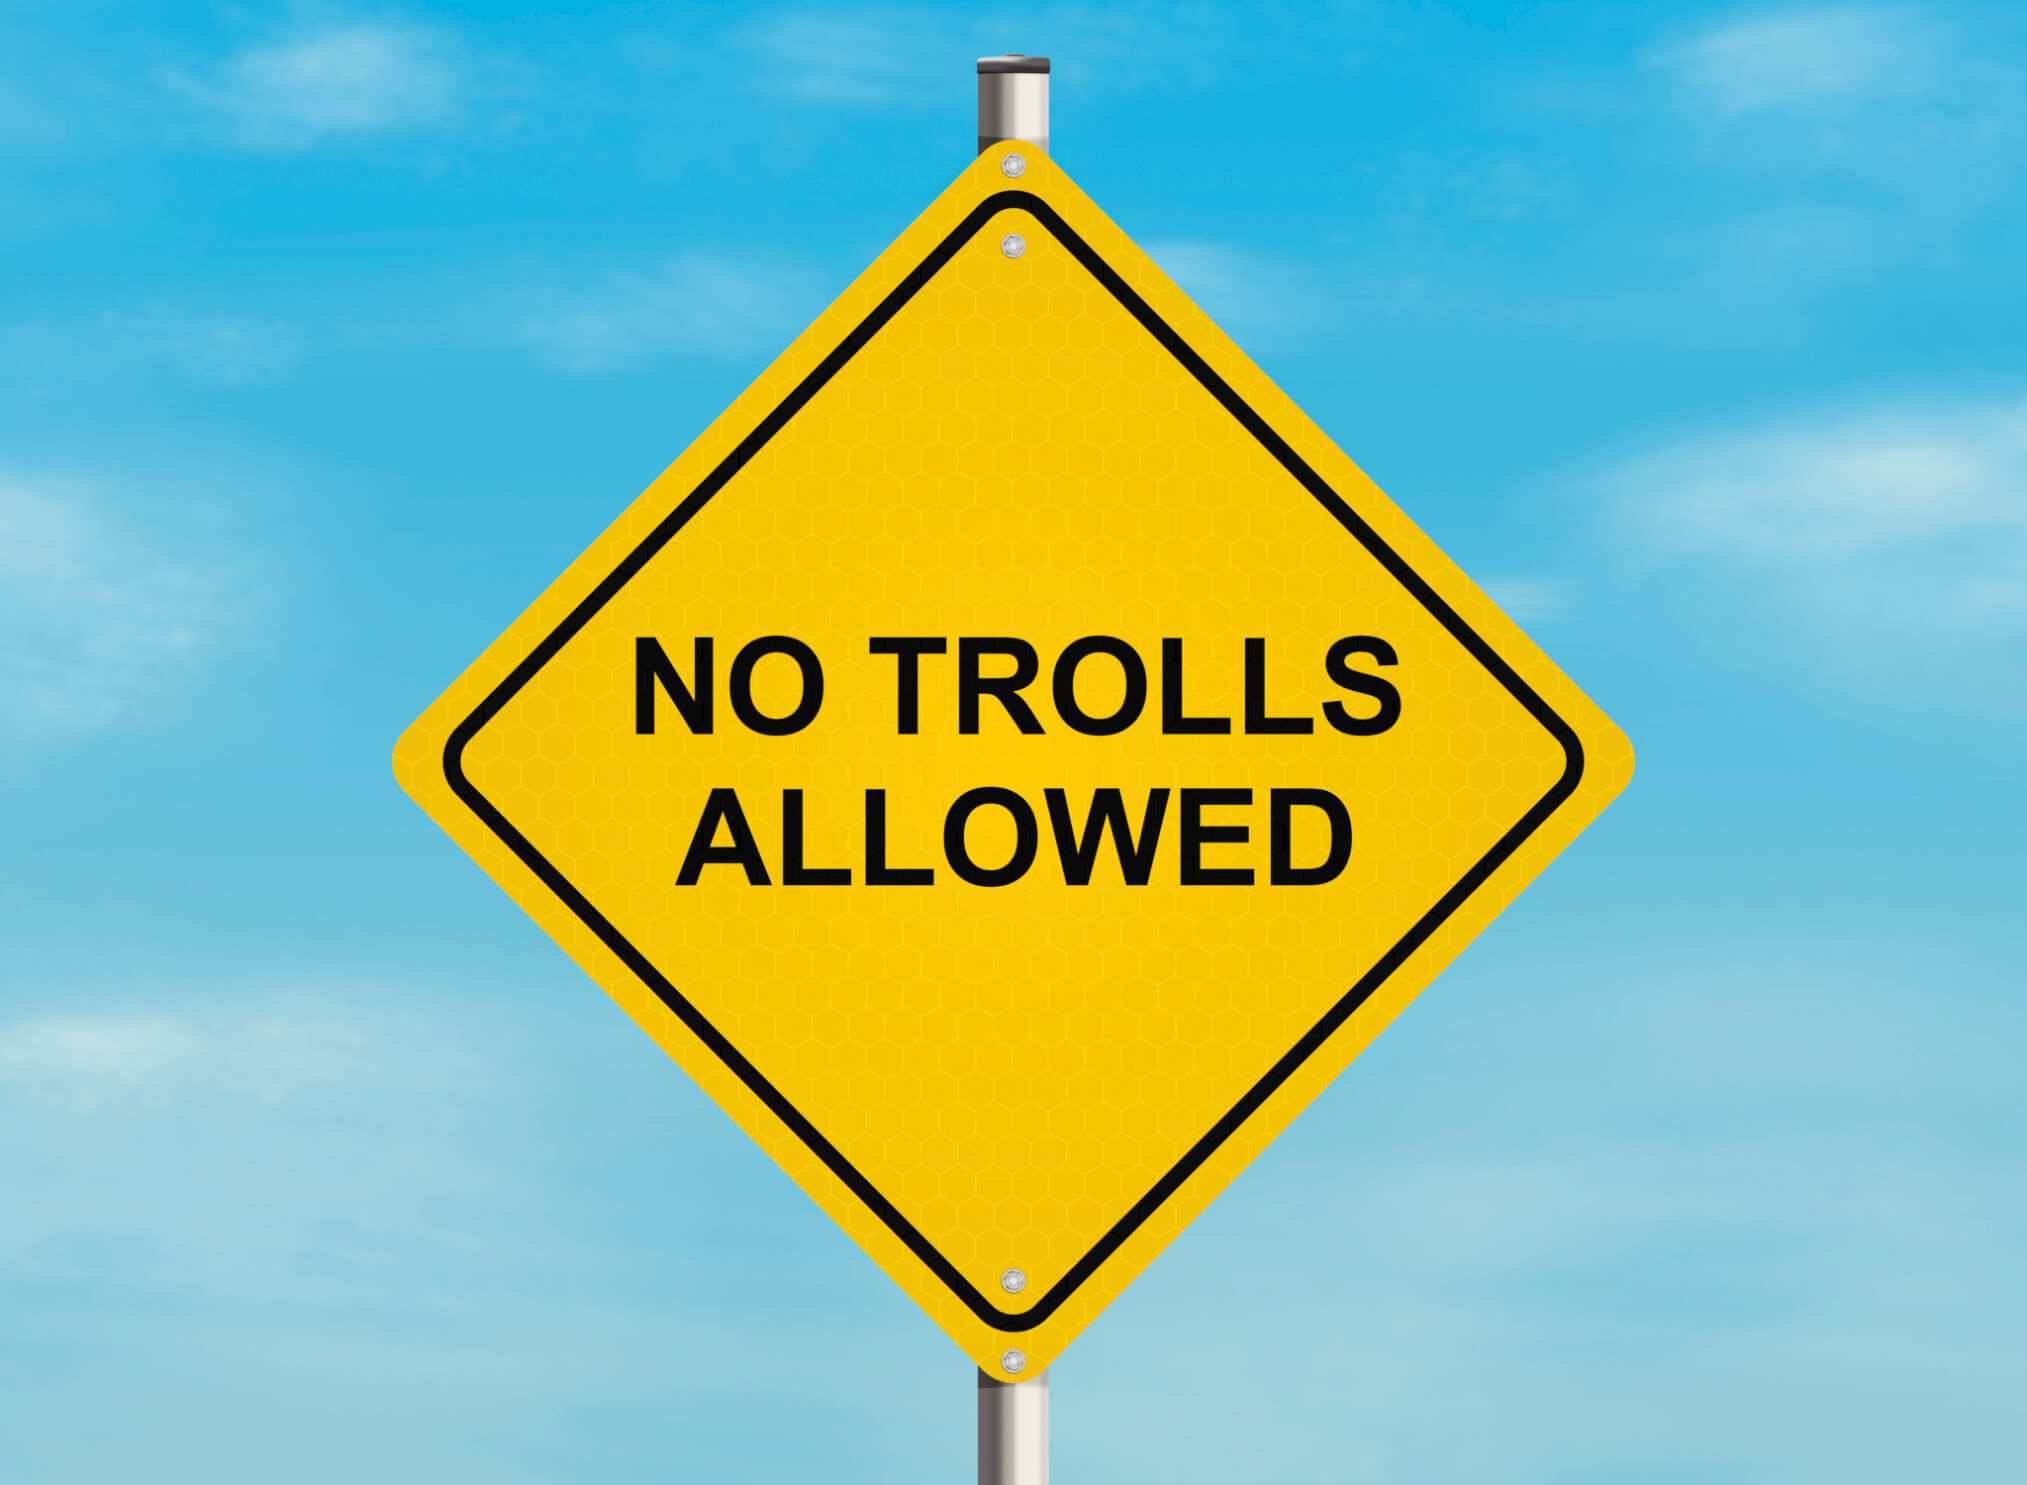 Trade mark trolls